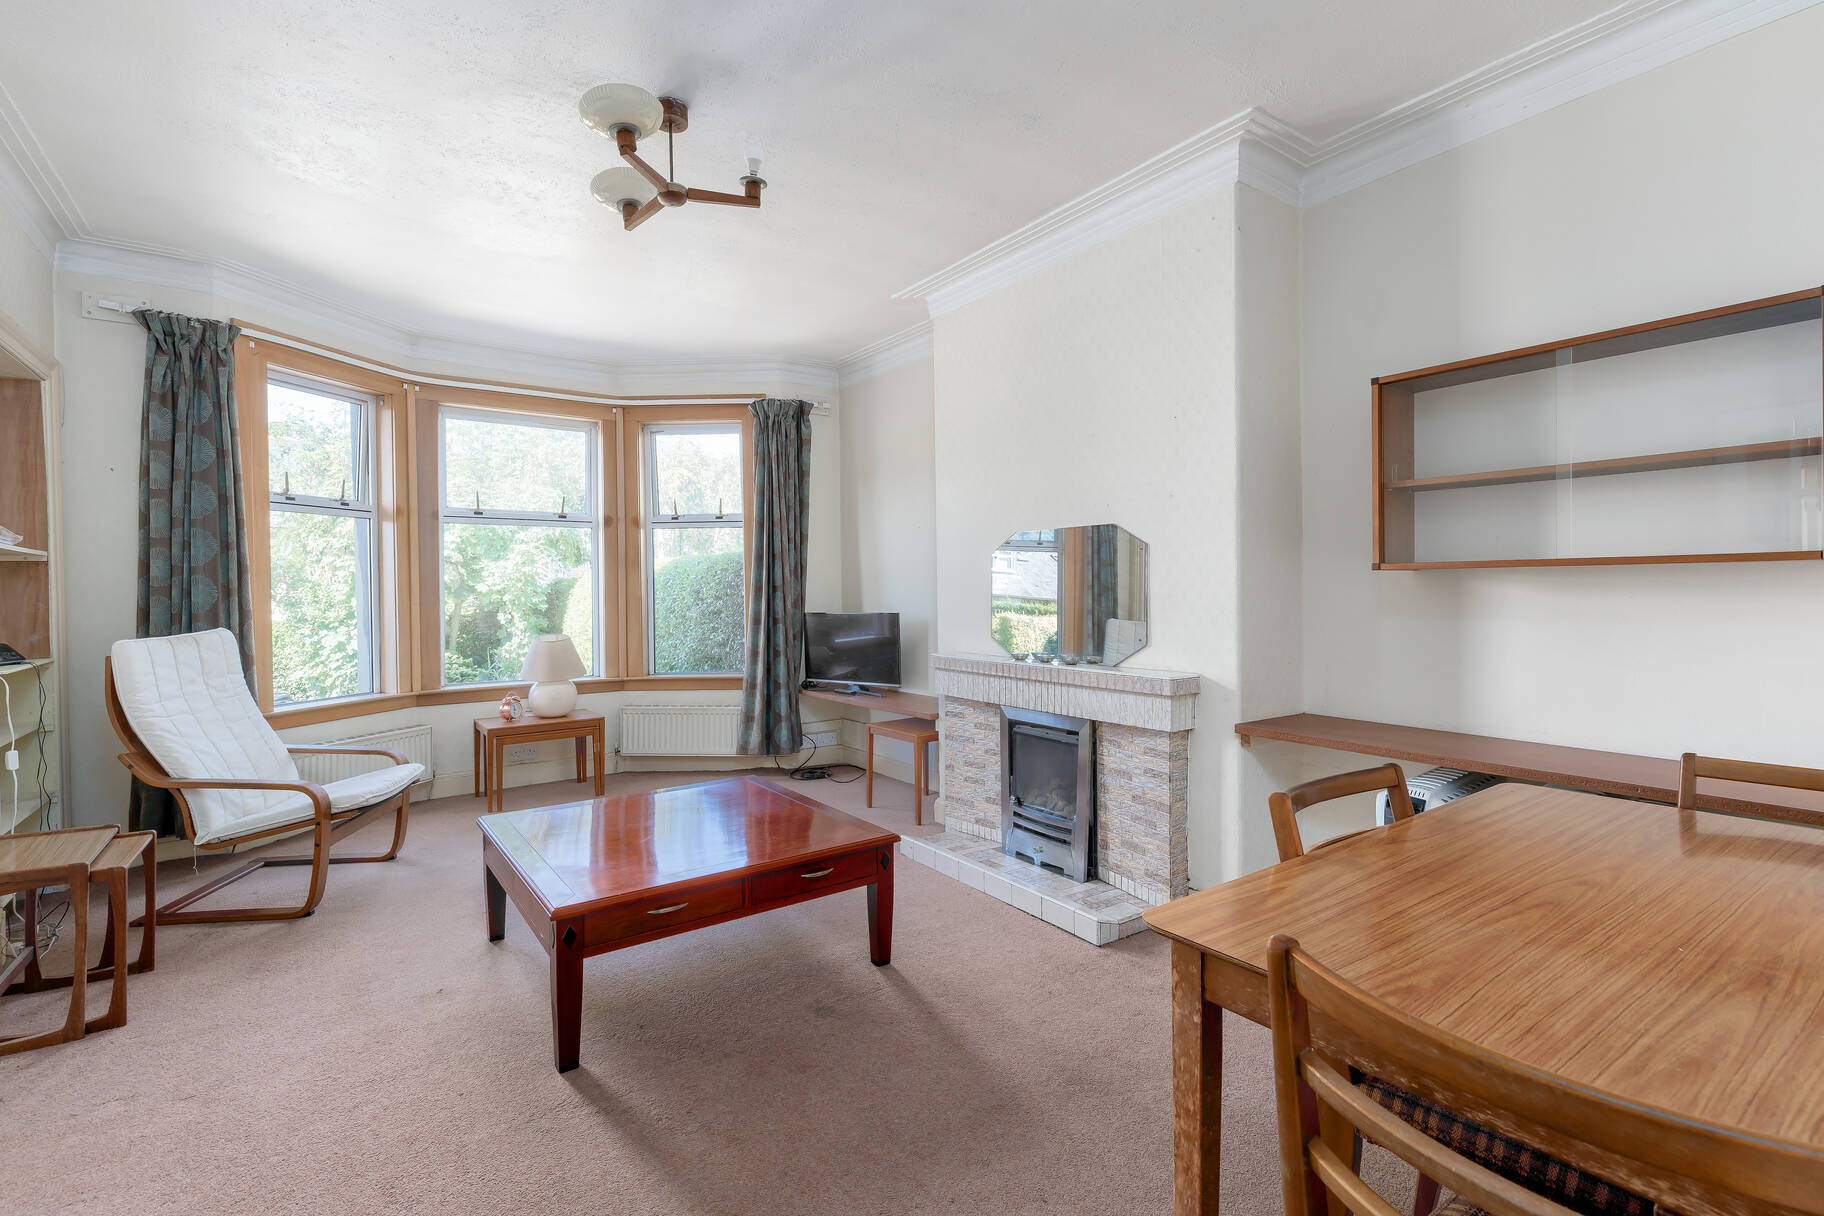 2 Gardiner Terrace, Blackhall, Edinburgh, EH4 3RS